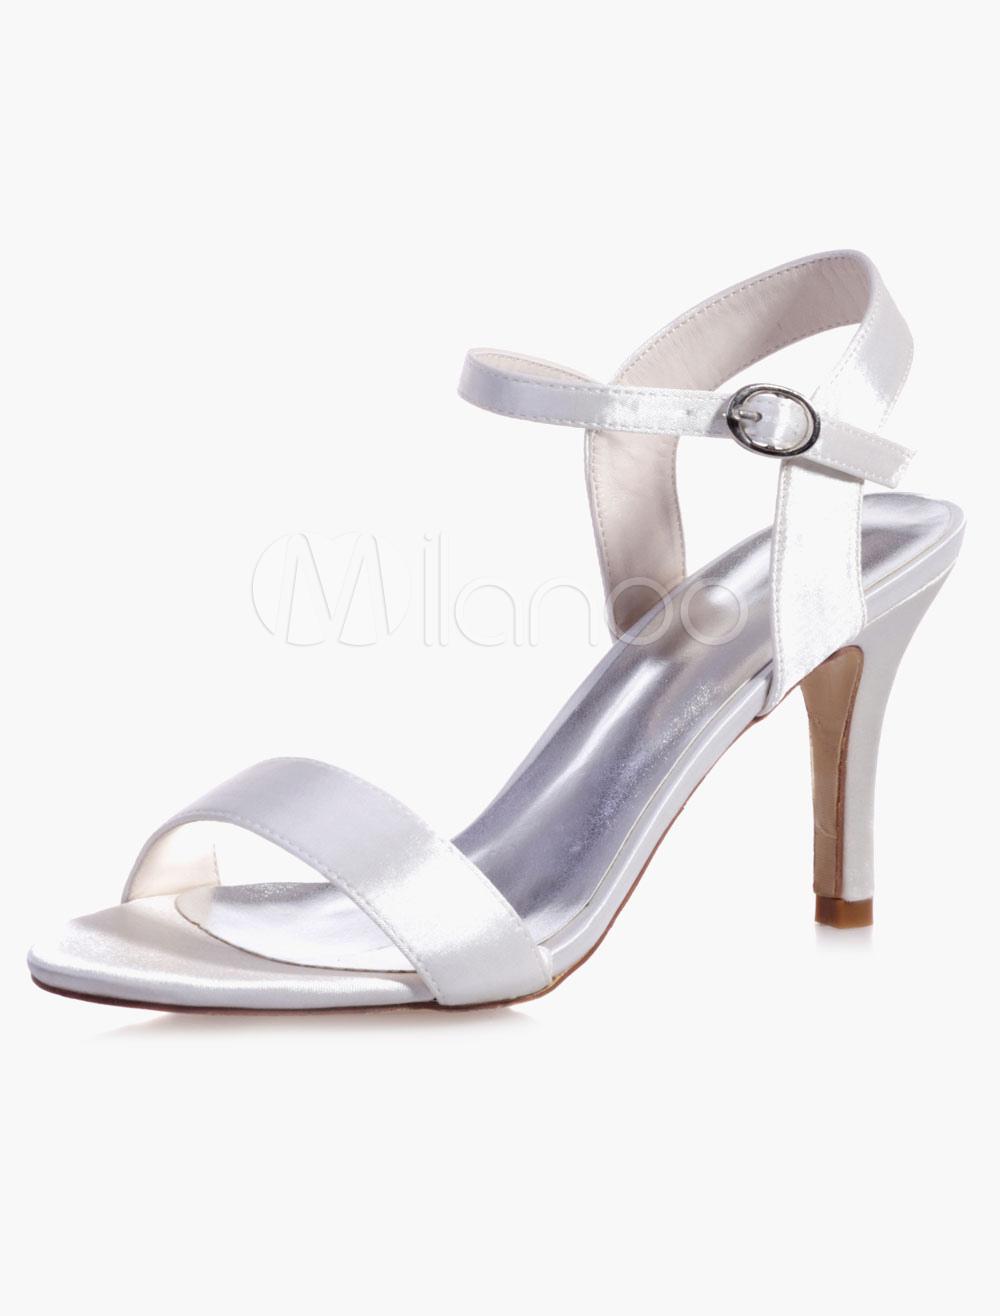 Milanoo / Elegant Ankle Strap Round Toe Evening And Bridal Sandals